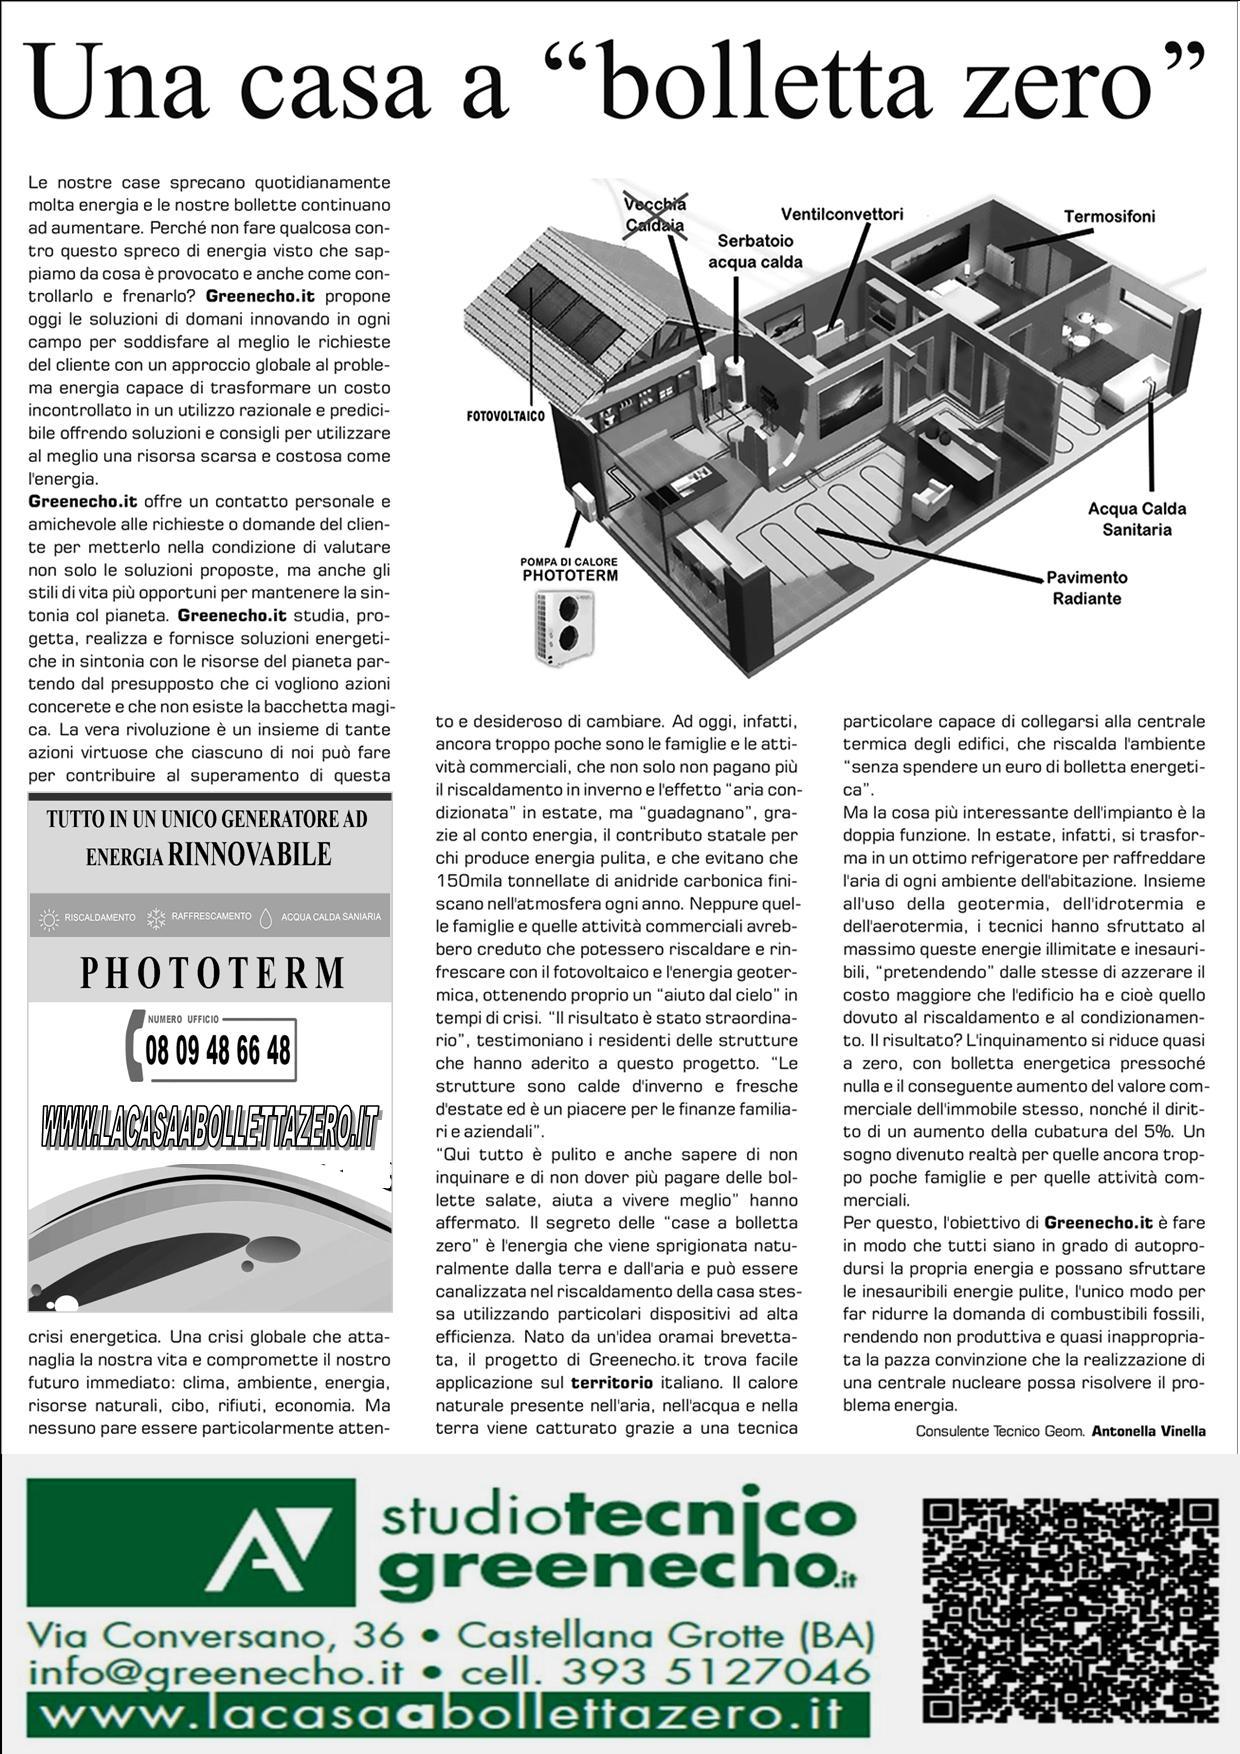 ARTICOLO-GREENECHO.jpg